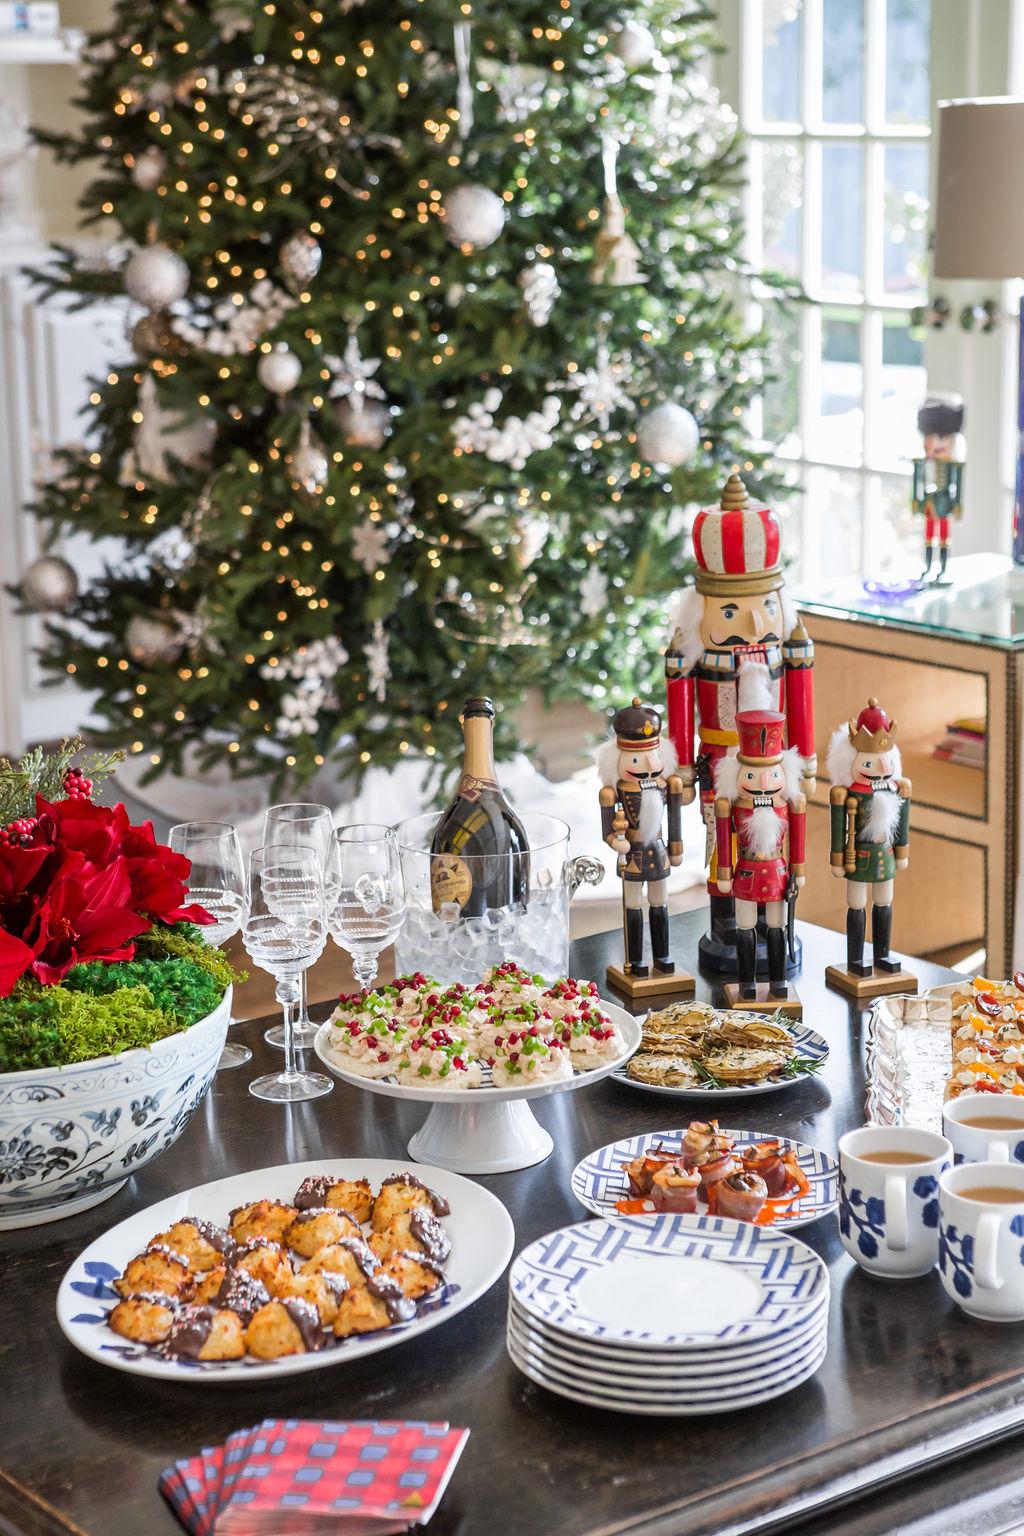 Christmas Nutcracker Display, Holiday Tea